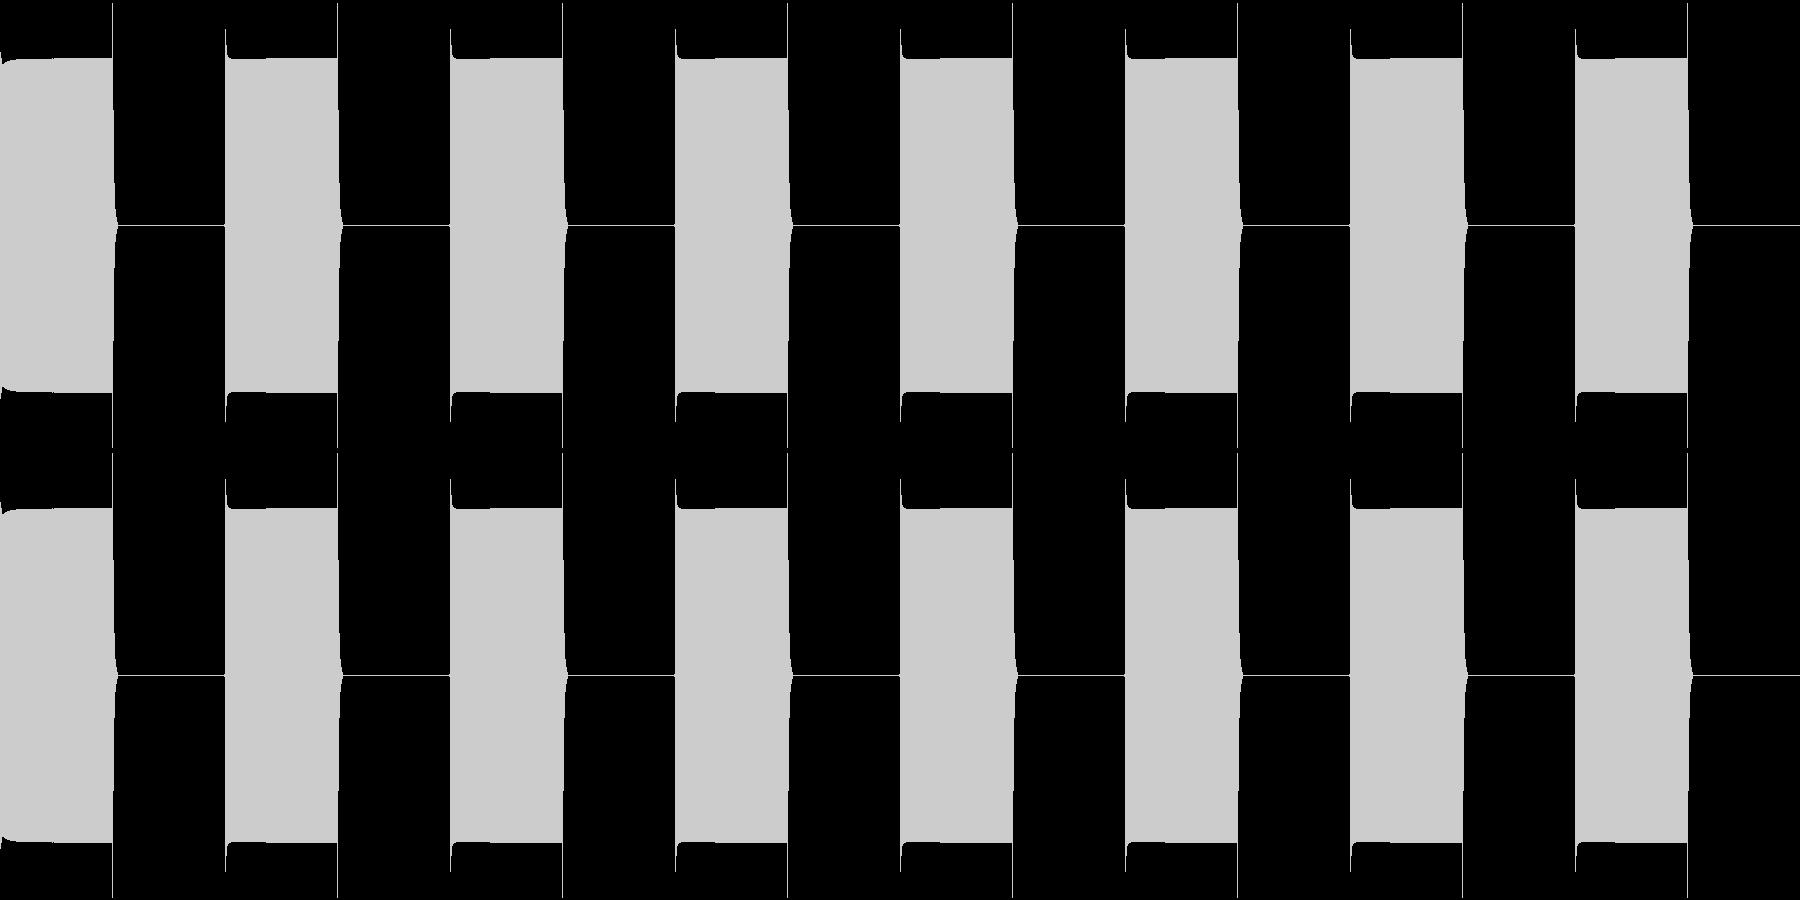 TEL 話し中のベル音 1 繋がらないの未再生の波形